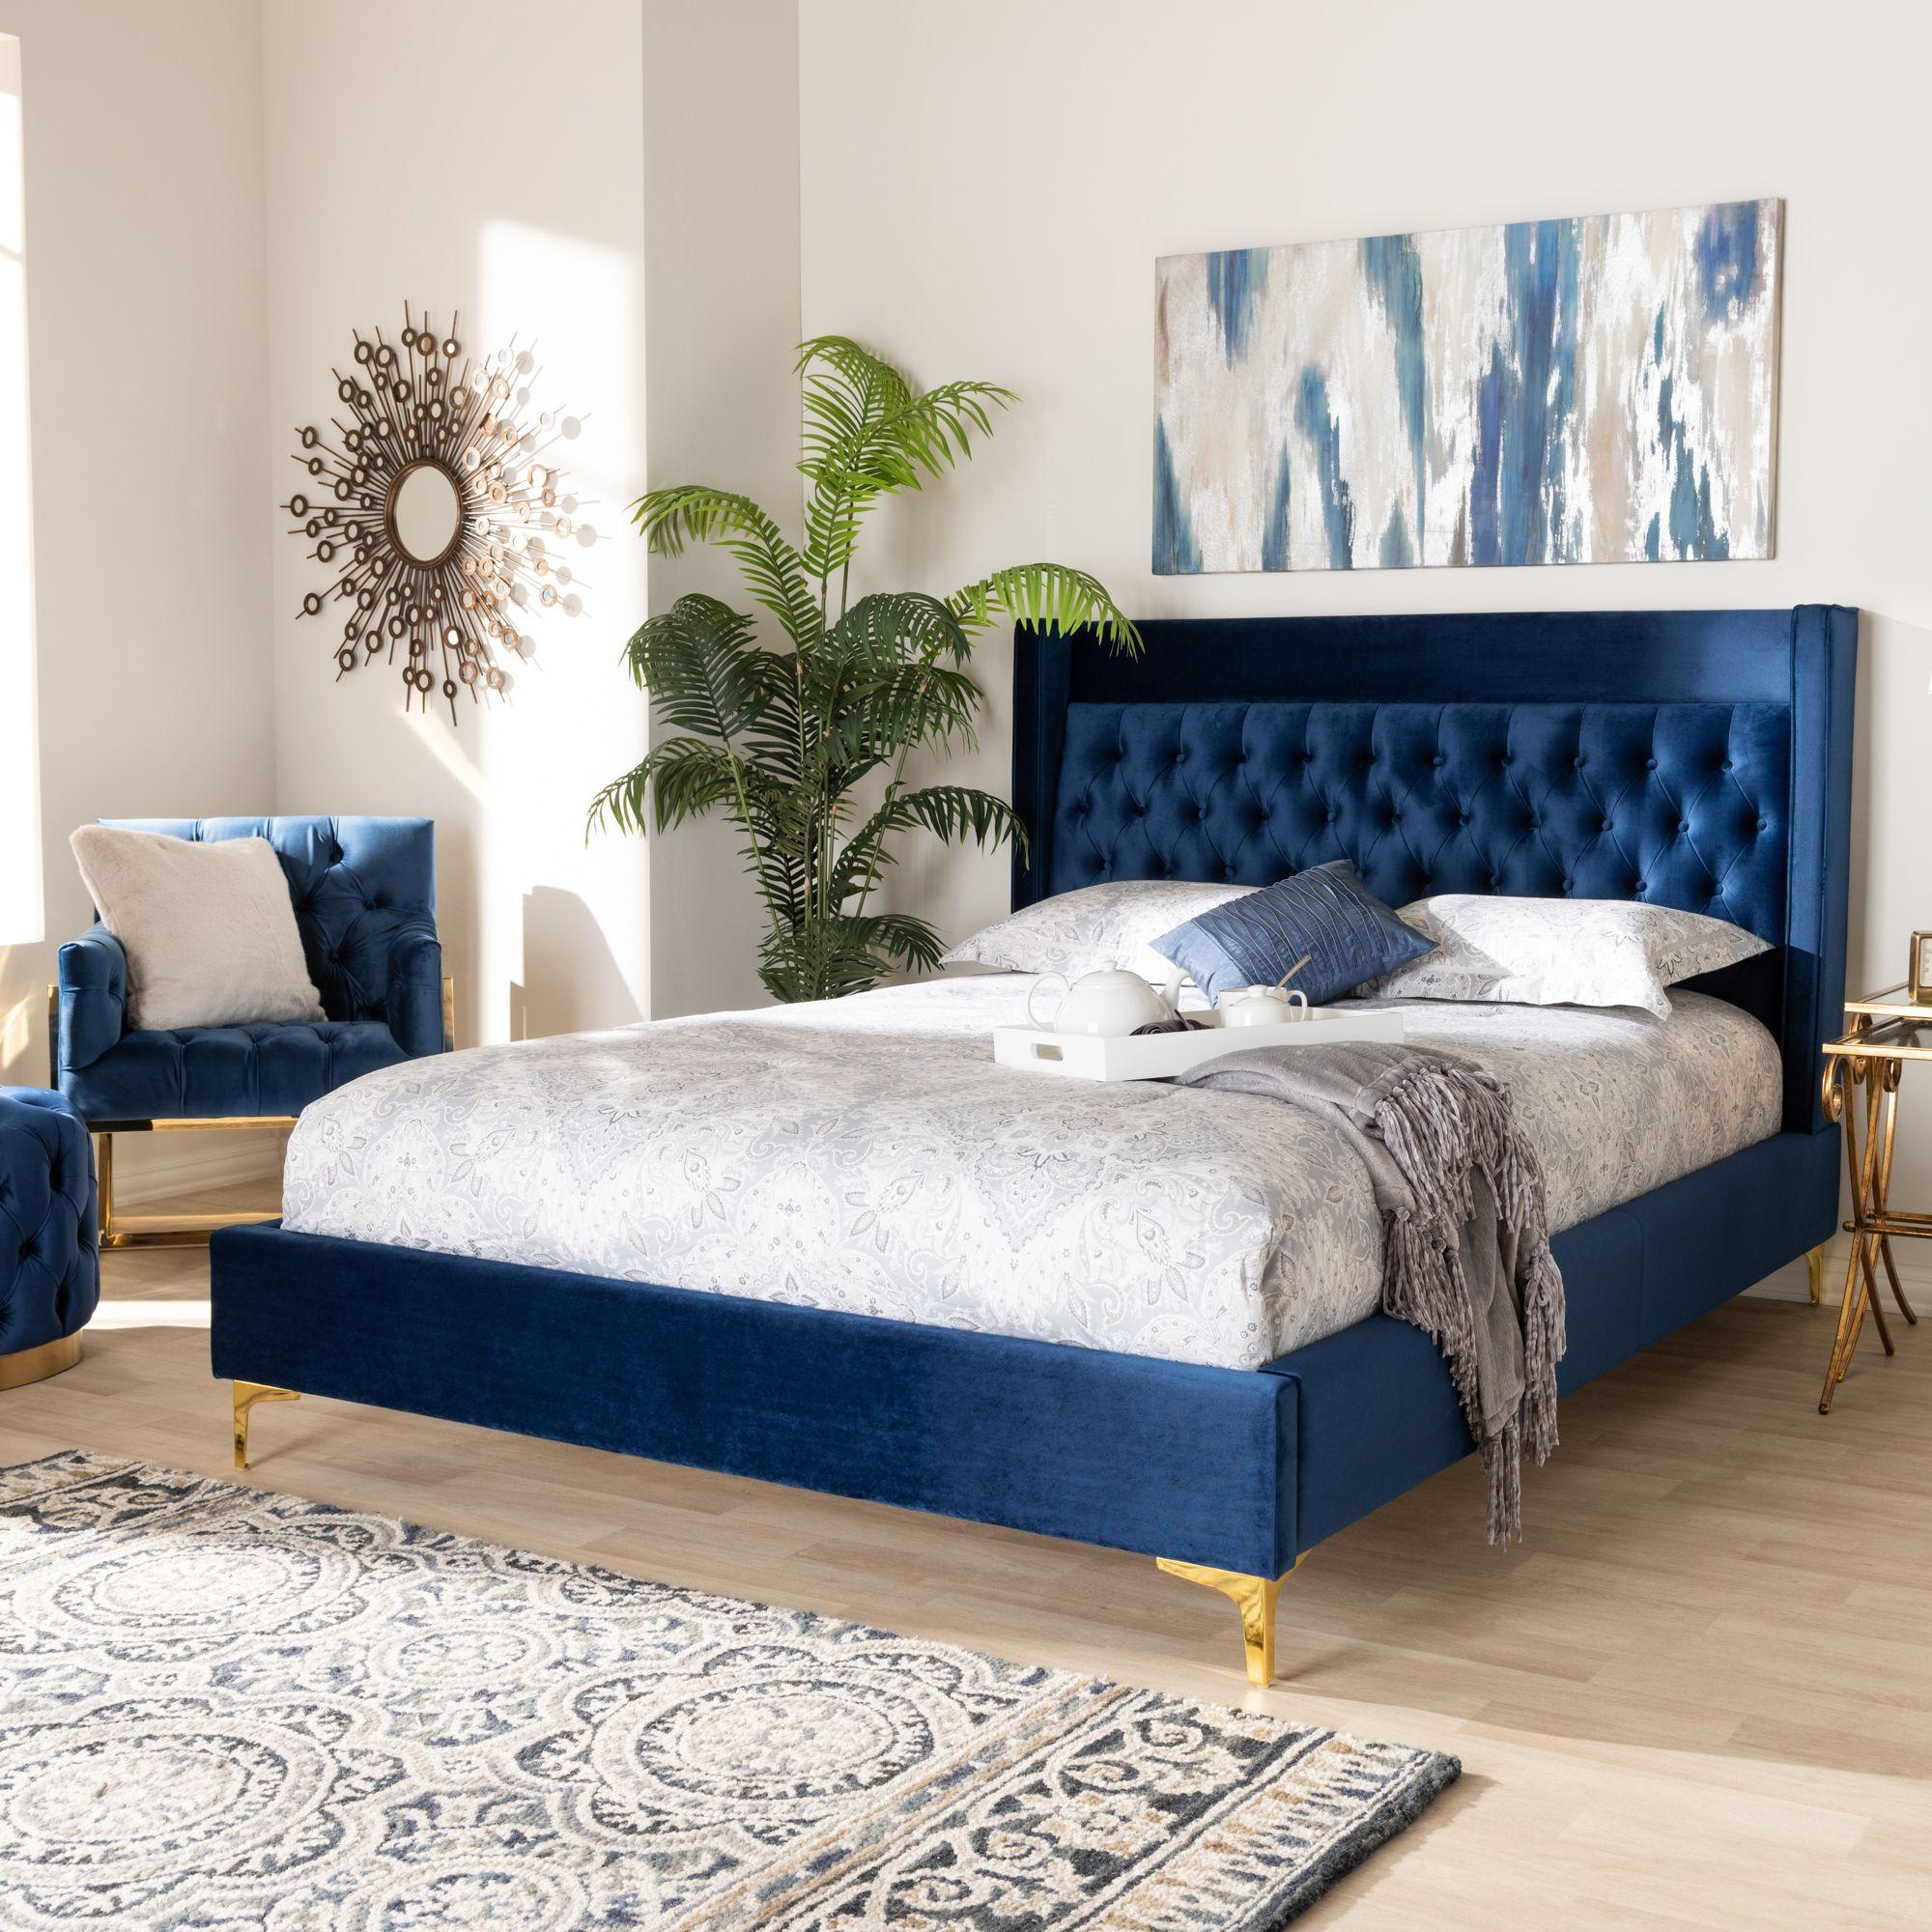 Baxton Studio Valery Modern and Contemporary Navy Blue